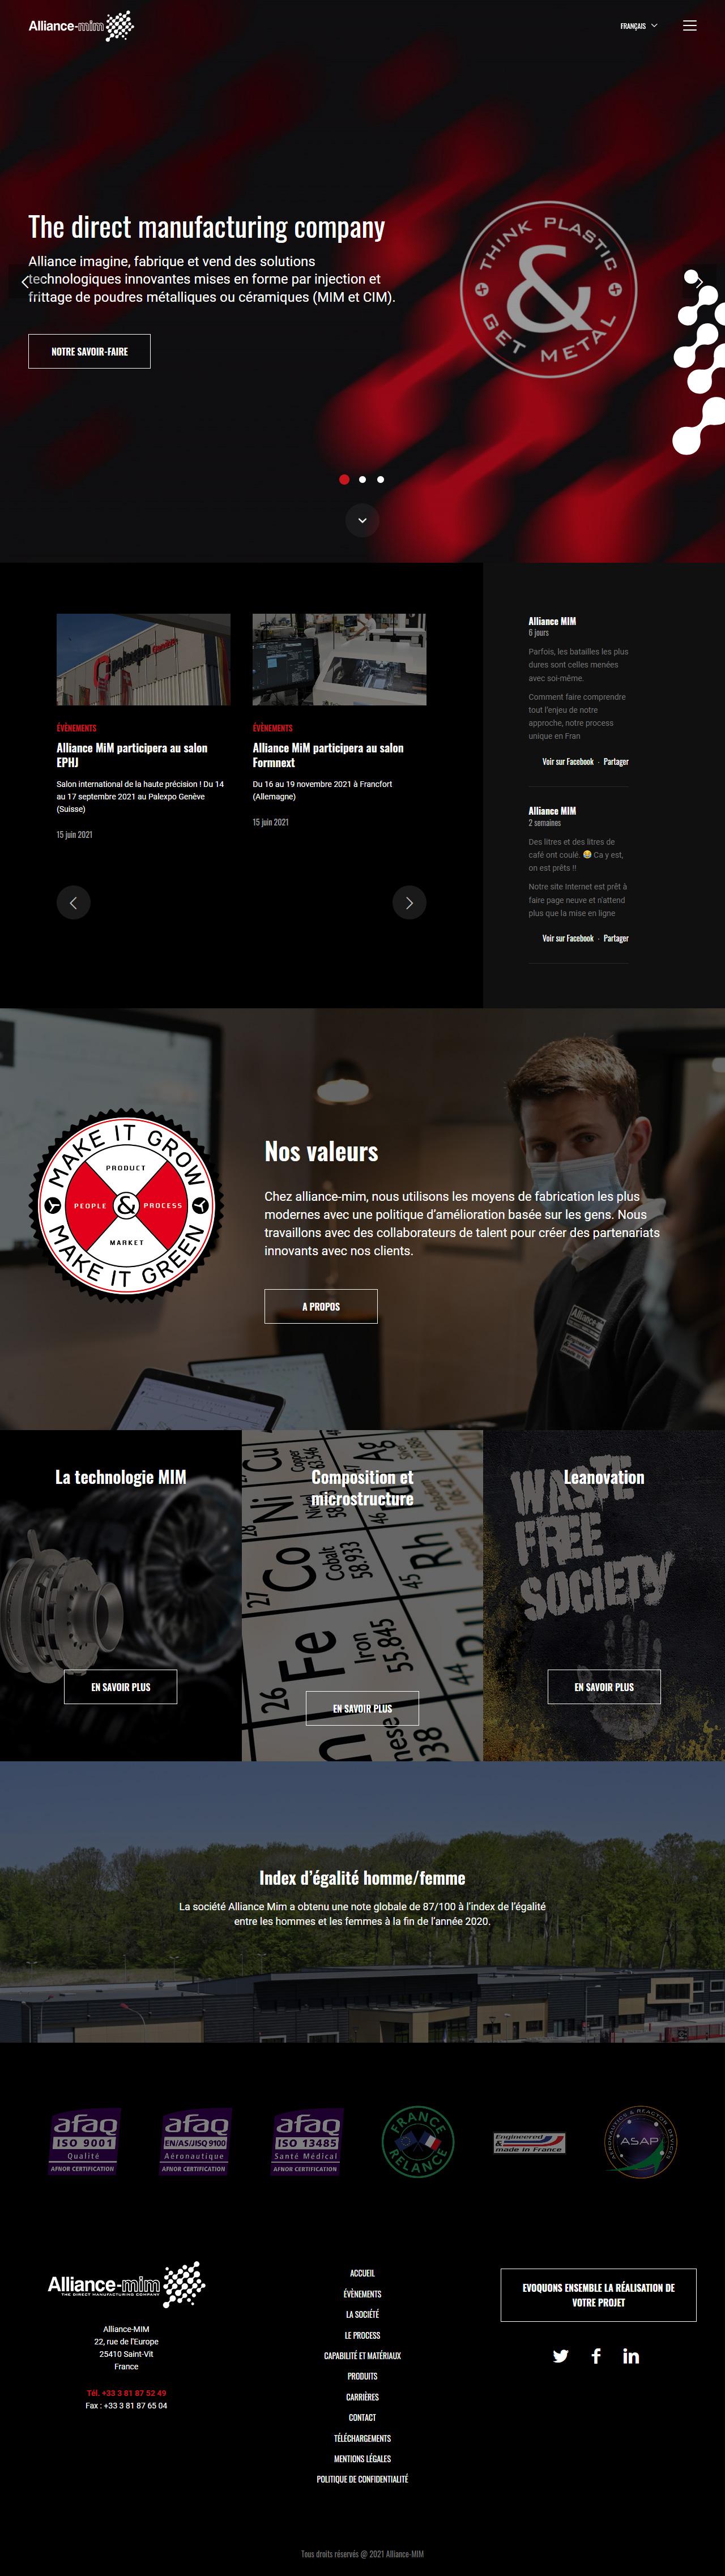 Refonte du site web - Alliance MIM